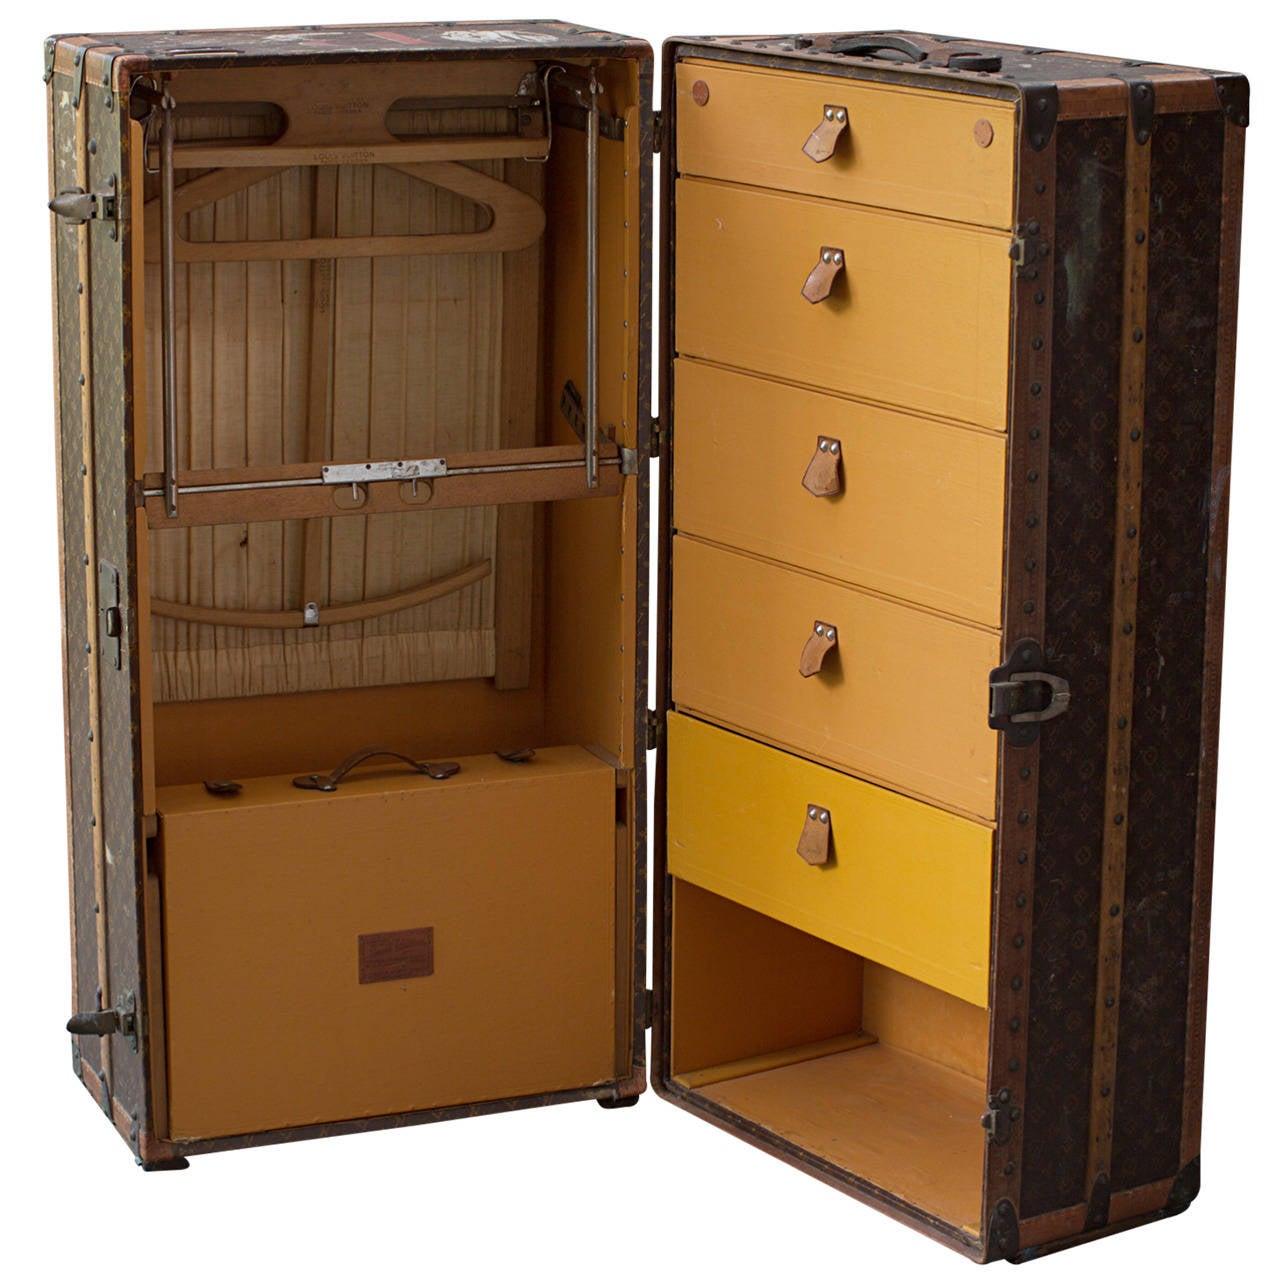 louis vuitton wardrobe trunk circa 1925 for sale - Wardrobe Trunk